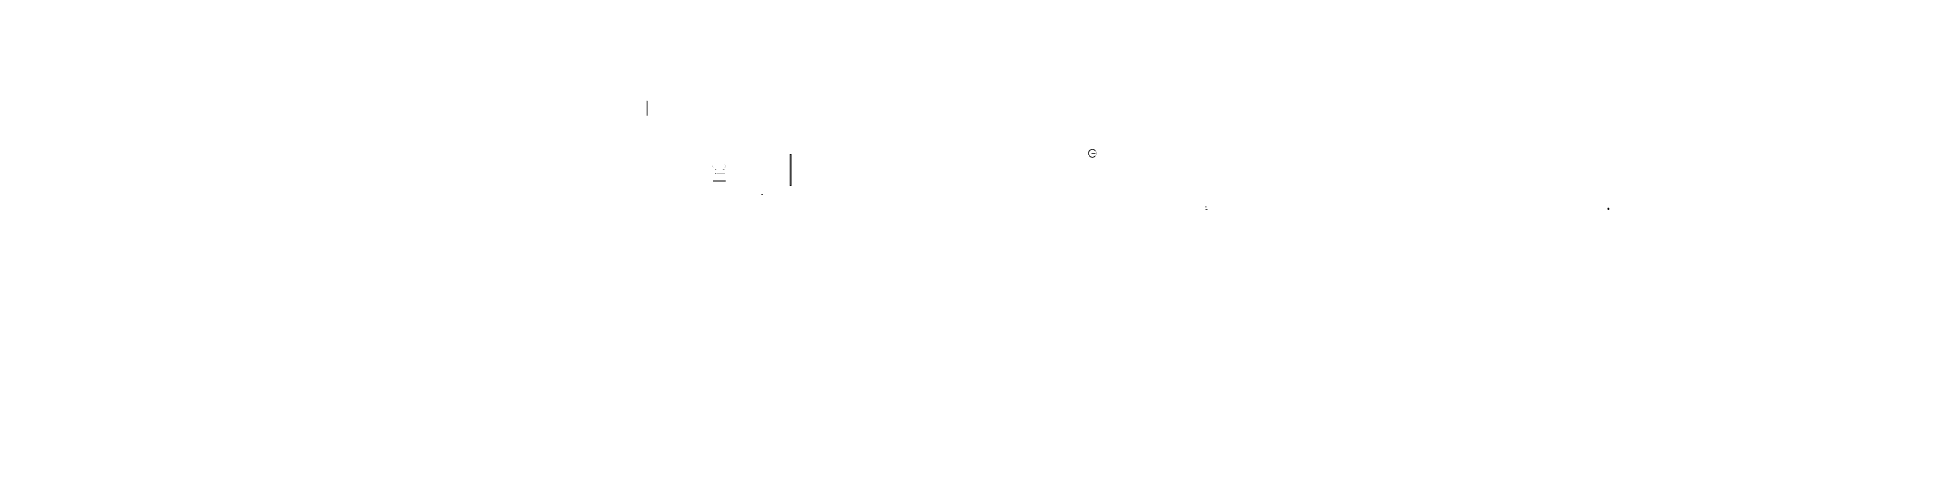 bateau etel plan de profil